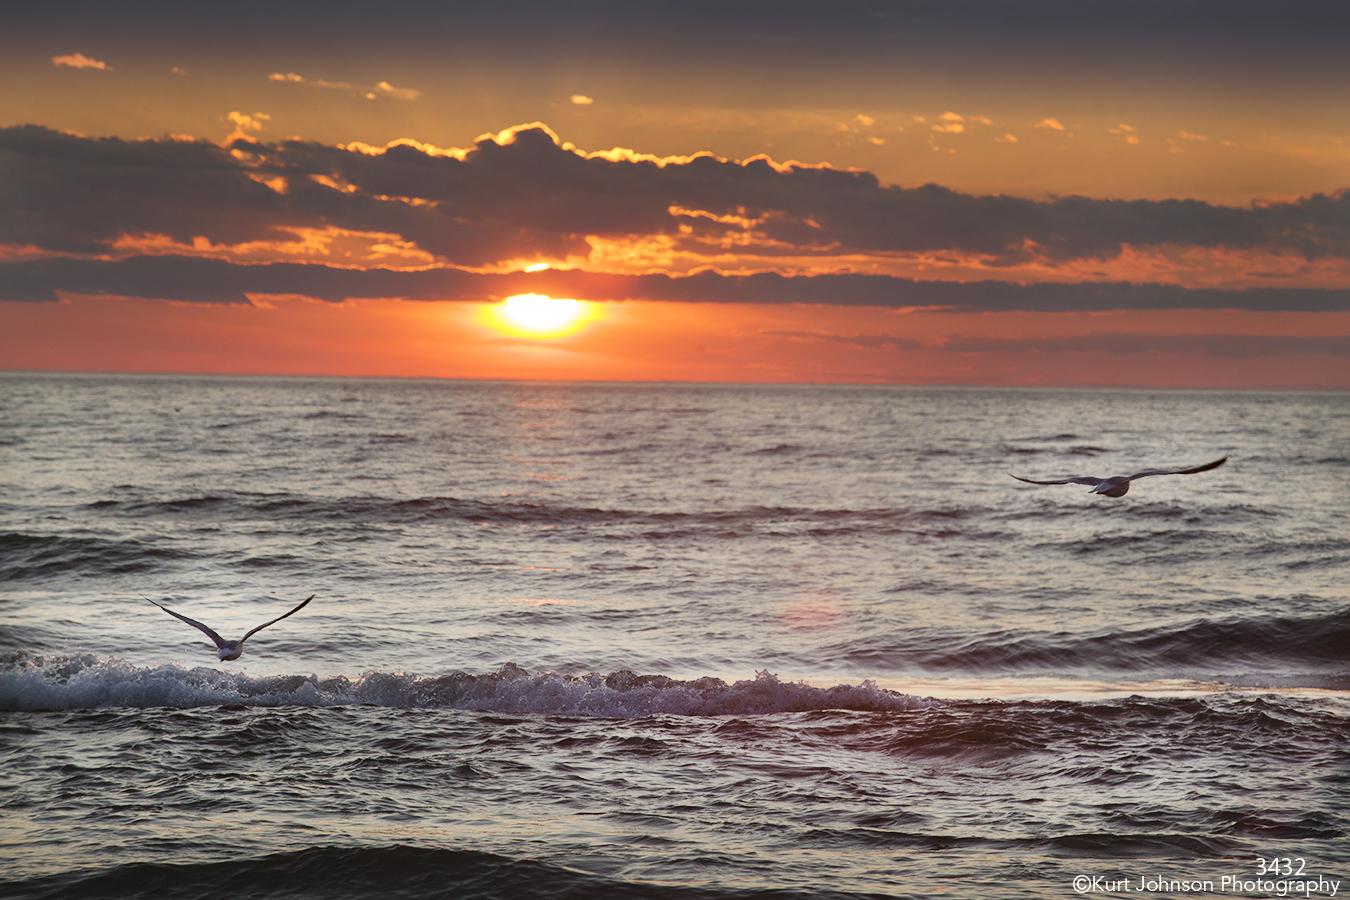 waterscape sunset birds waves ocean water clouds sky blue orange